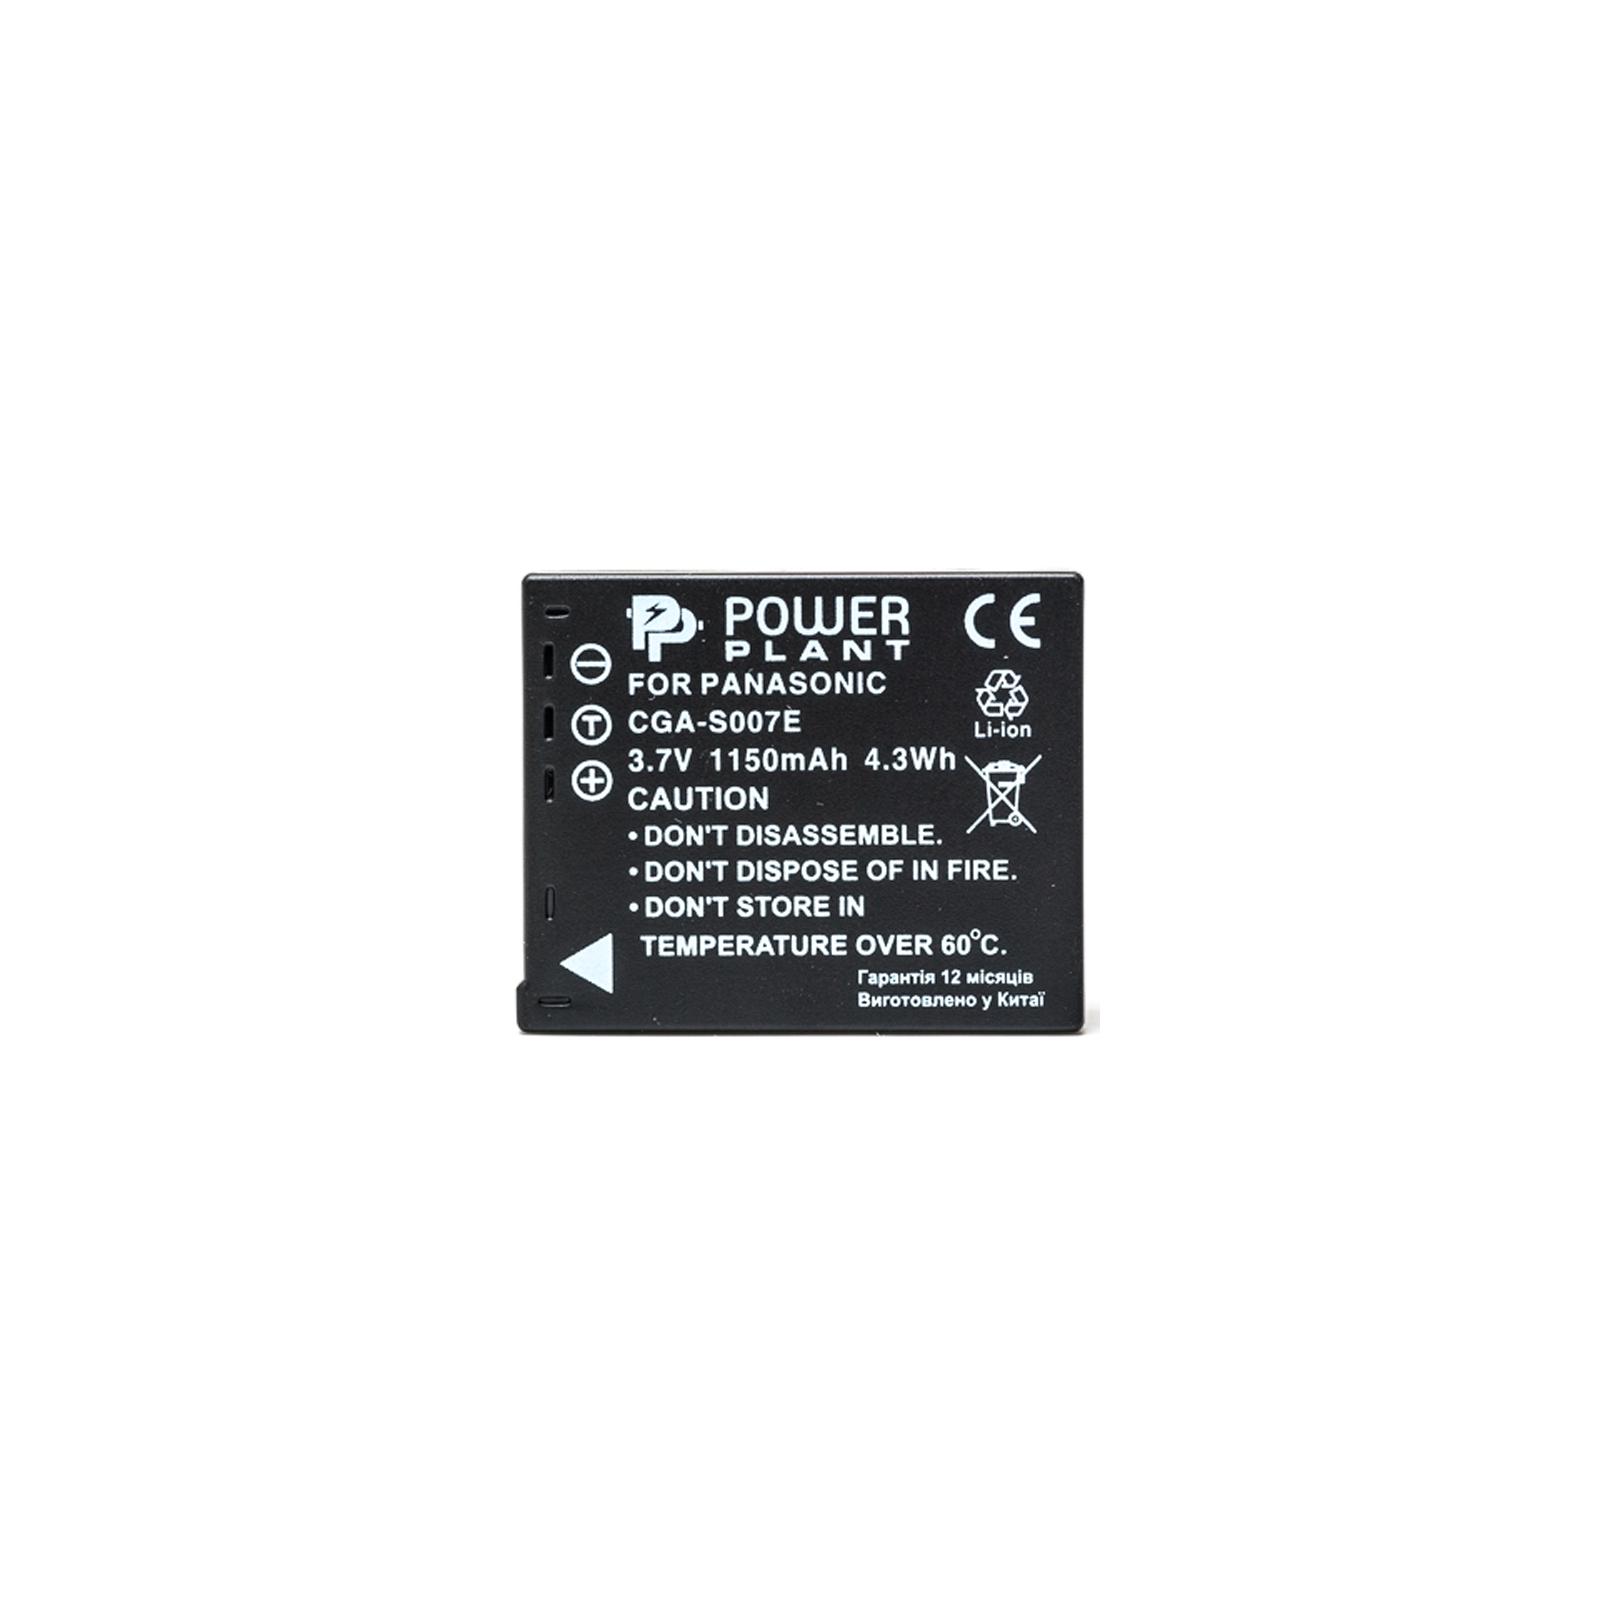 Аккумулятор к фото/видео PowerPlant Panasonic S007 (DV00DV1147) изображение 2